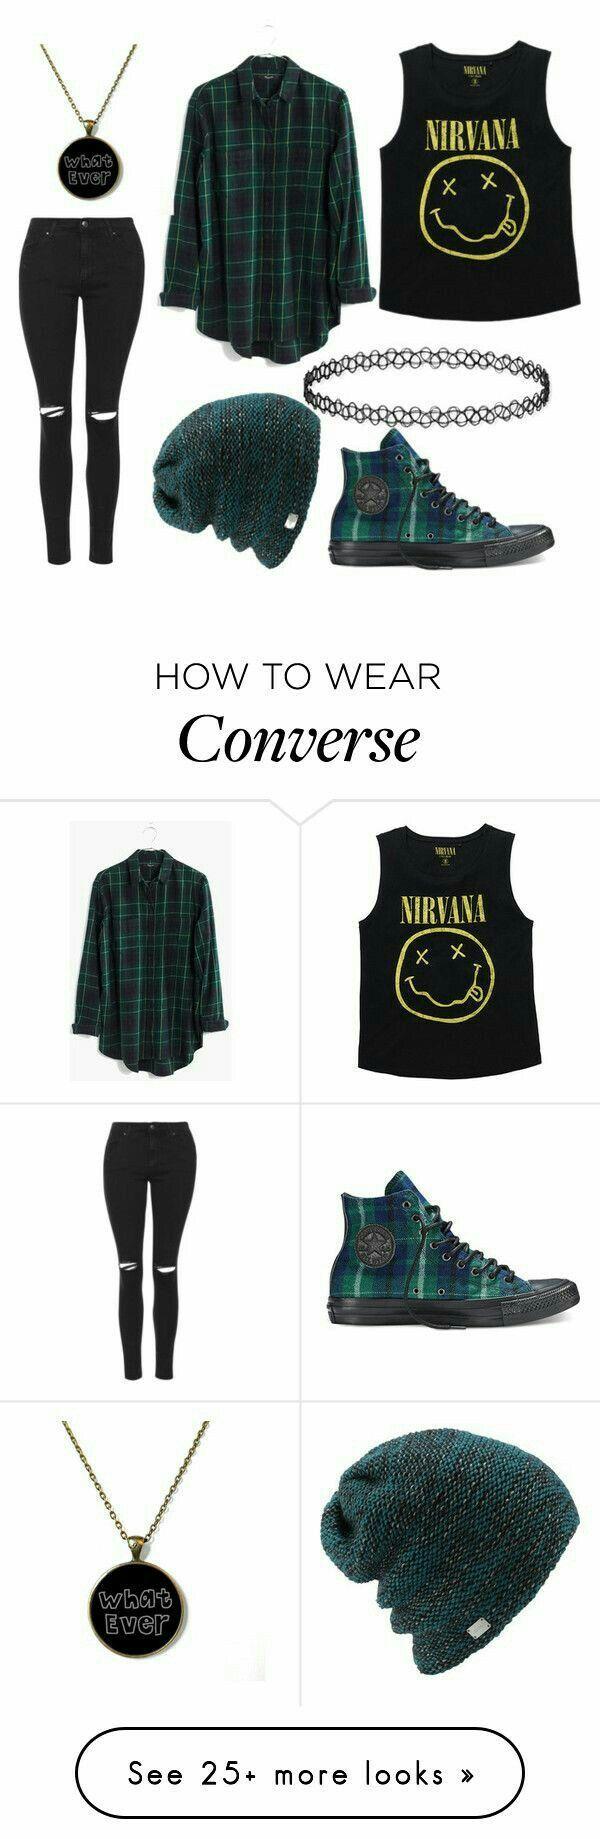 #Ropa #Moda #Outfits #Style #Nirvana #grungeoutfits